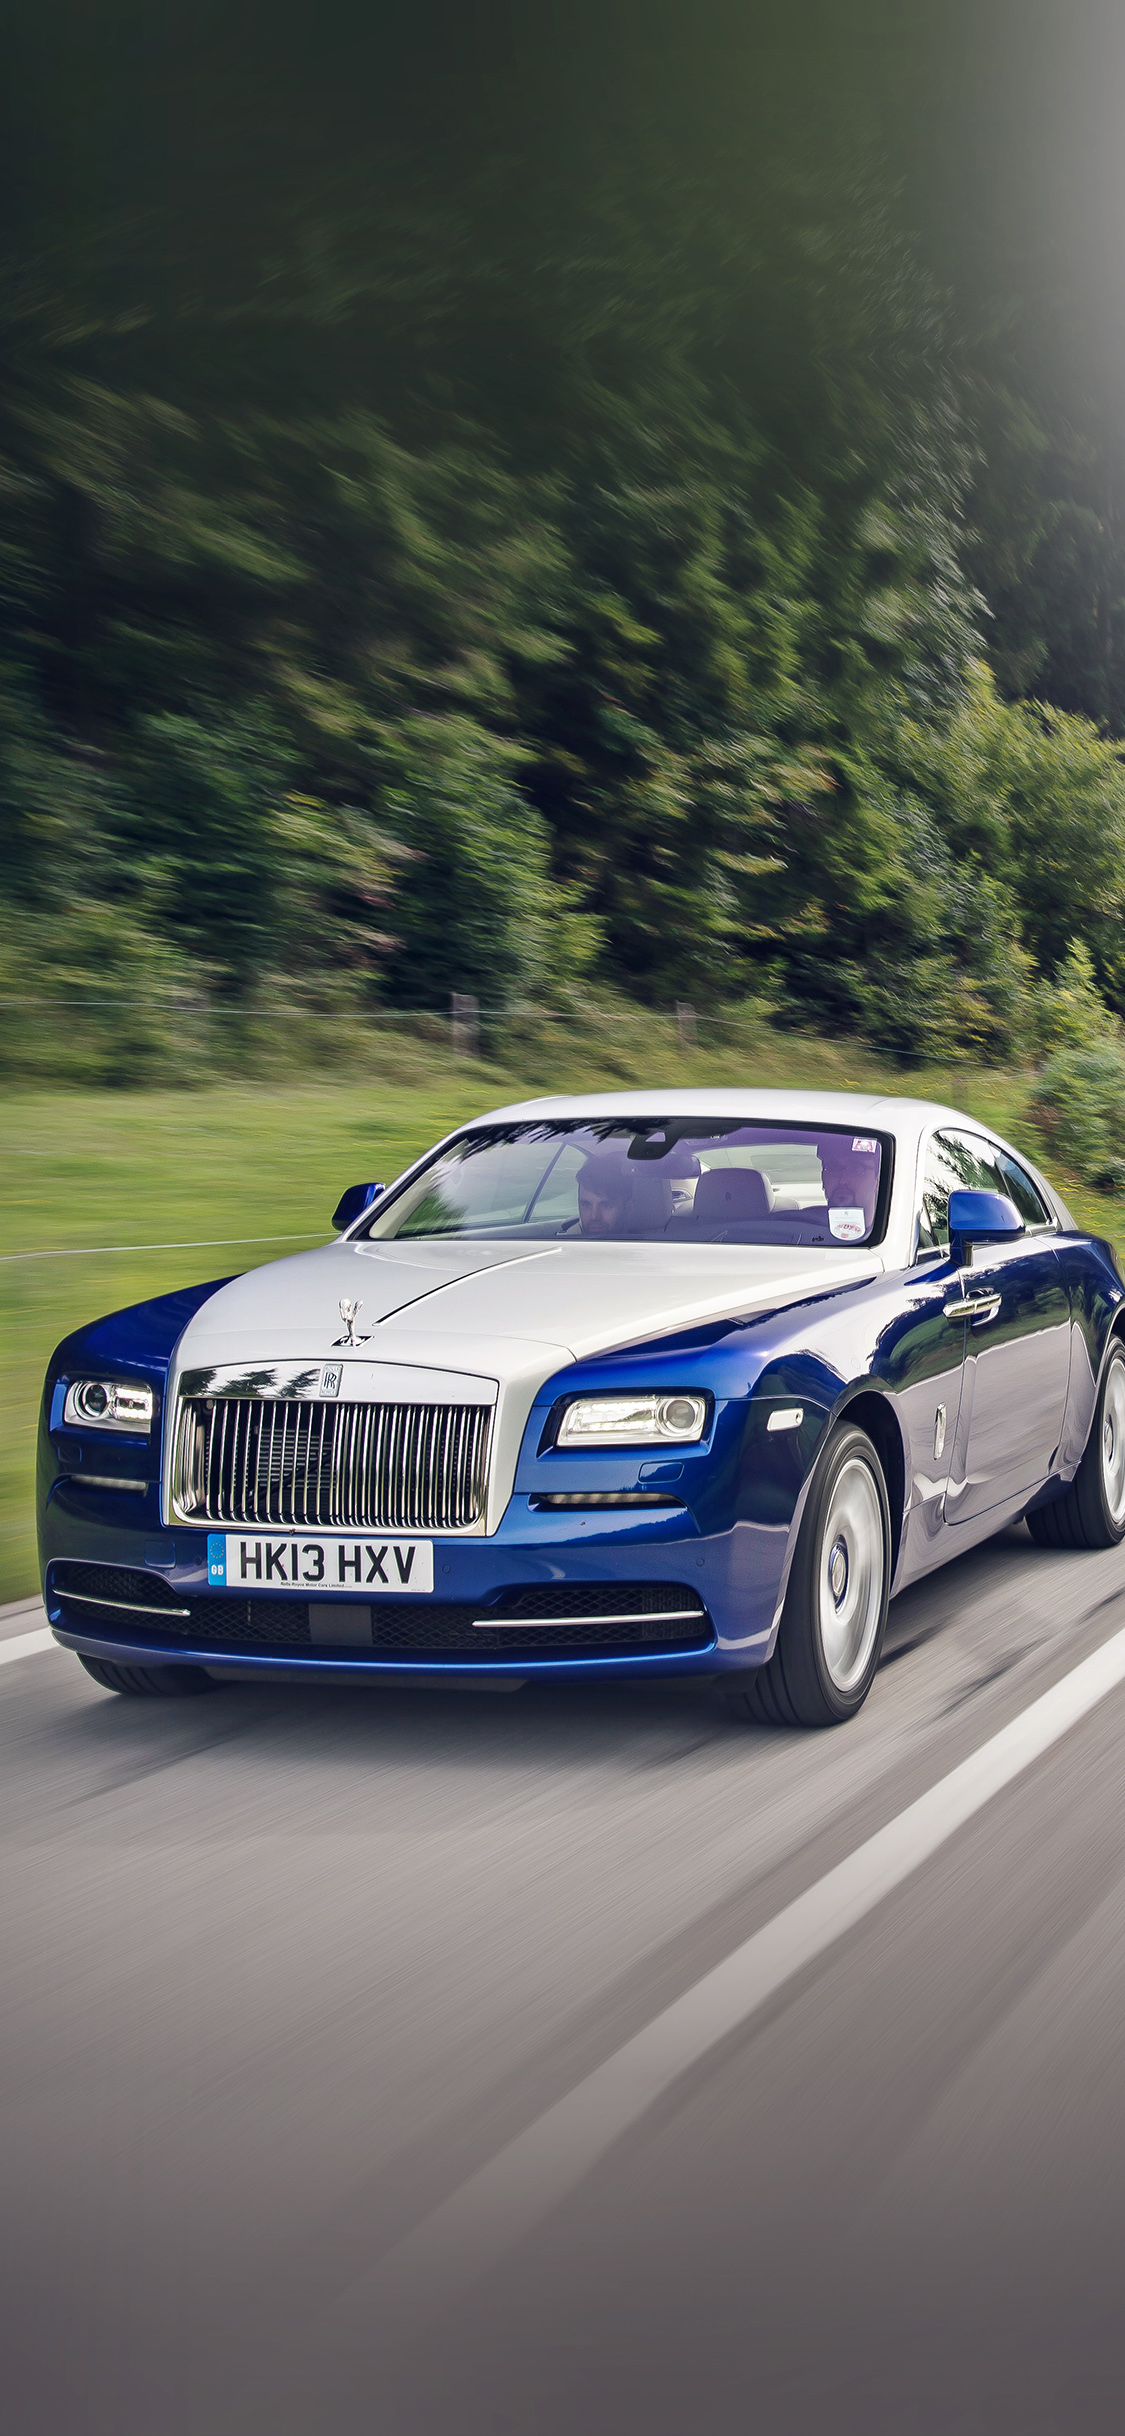 Aj95 Bentley Blue Drive Car Papers Co